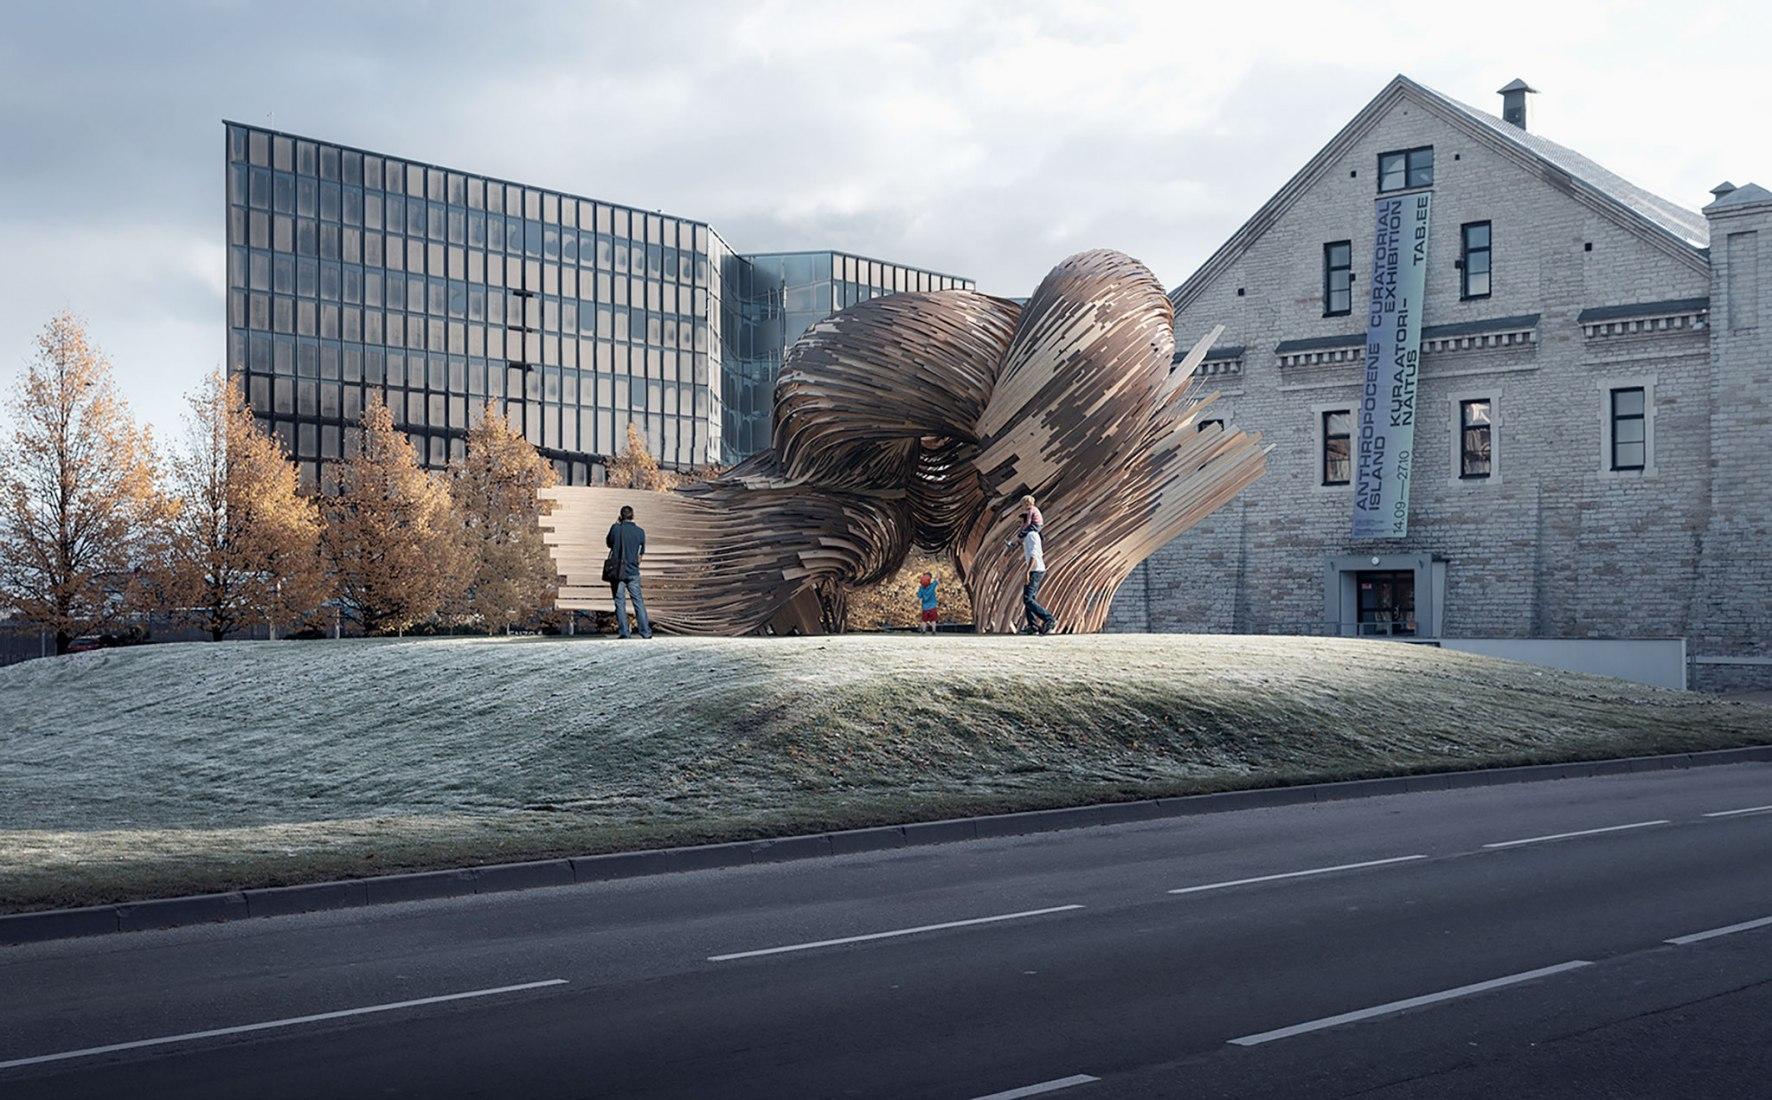 Rendering. Steampunk, designed by SoomeenHahm Design, Igor Pantic and Fologram